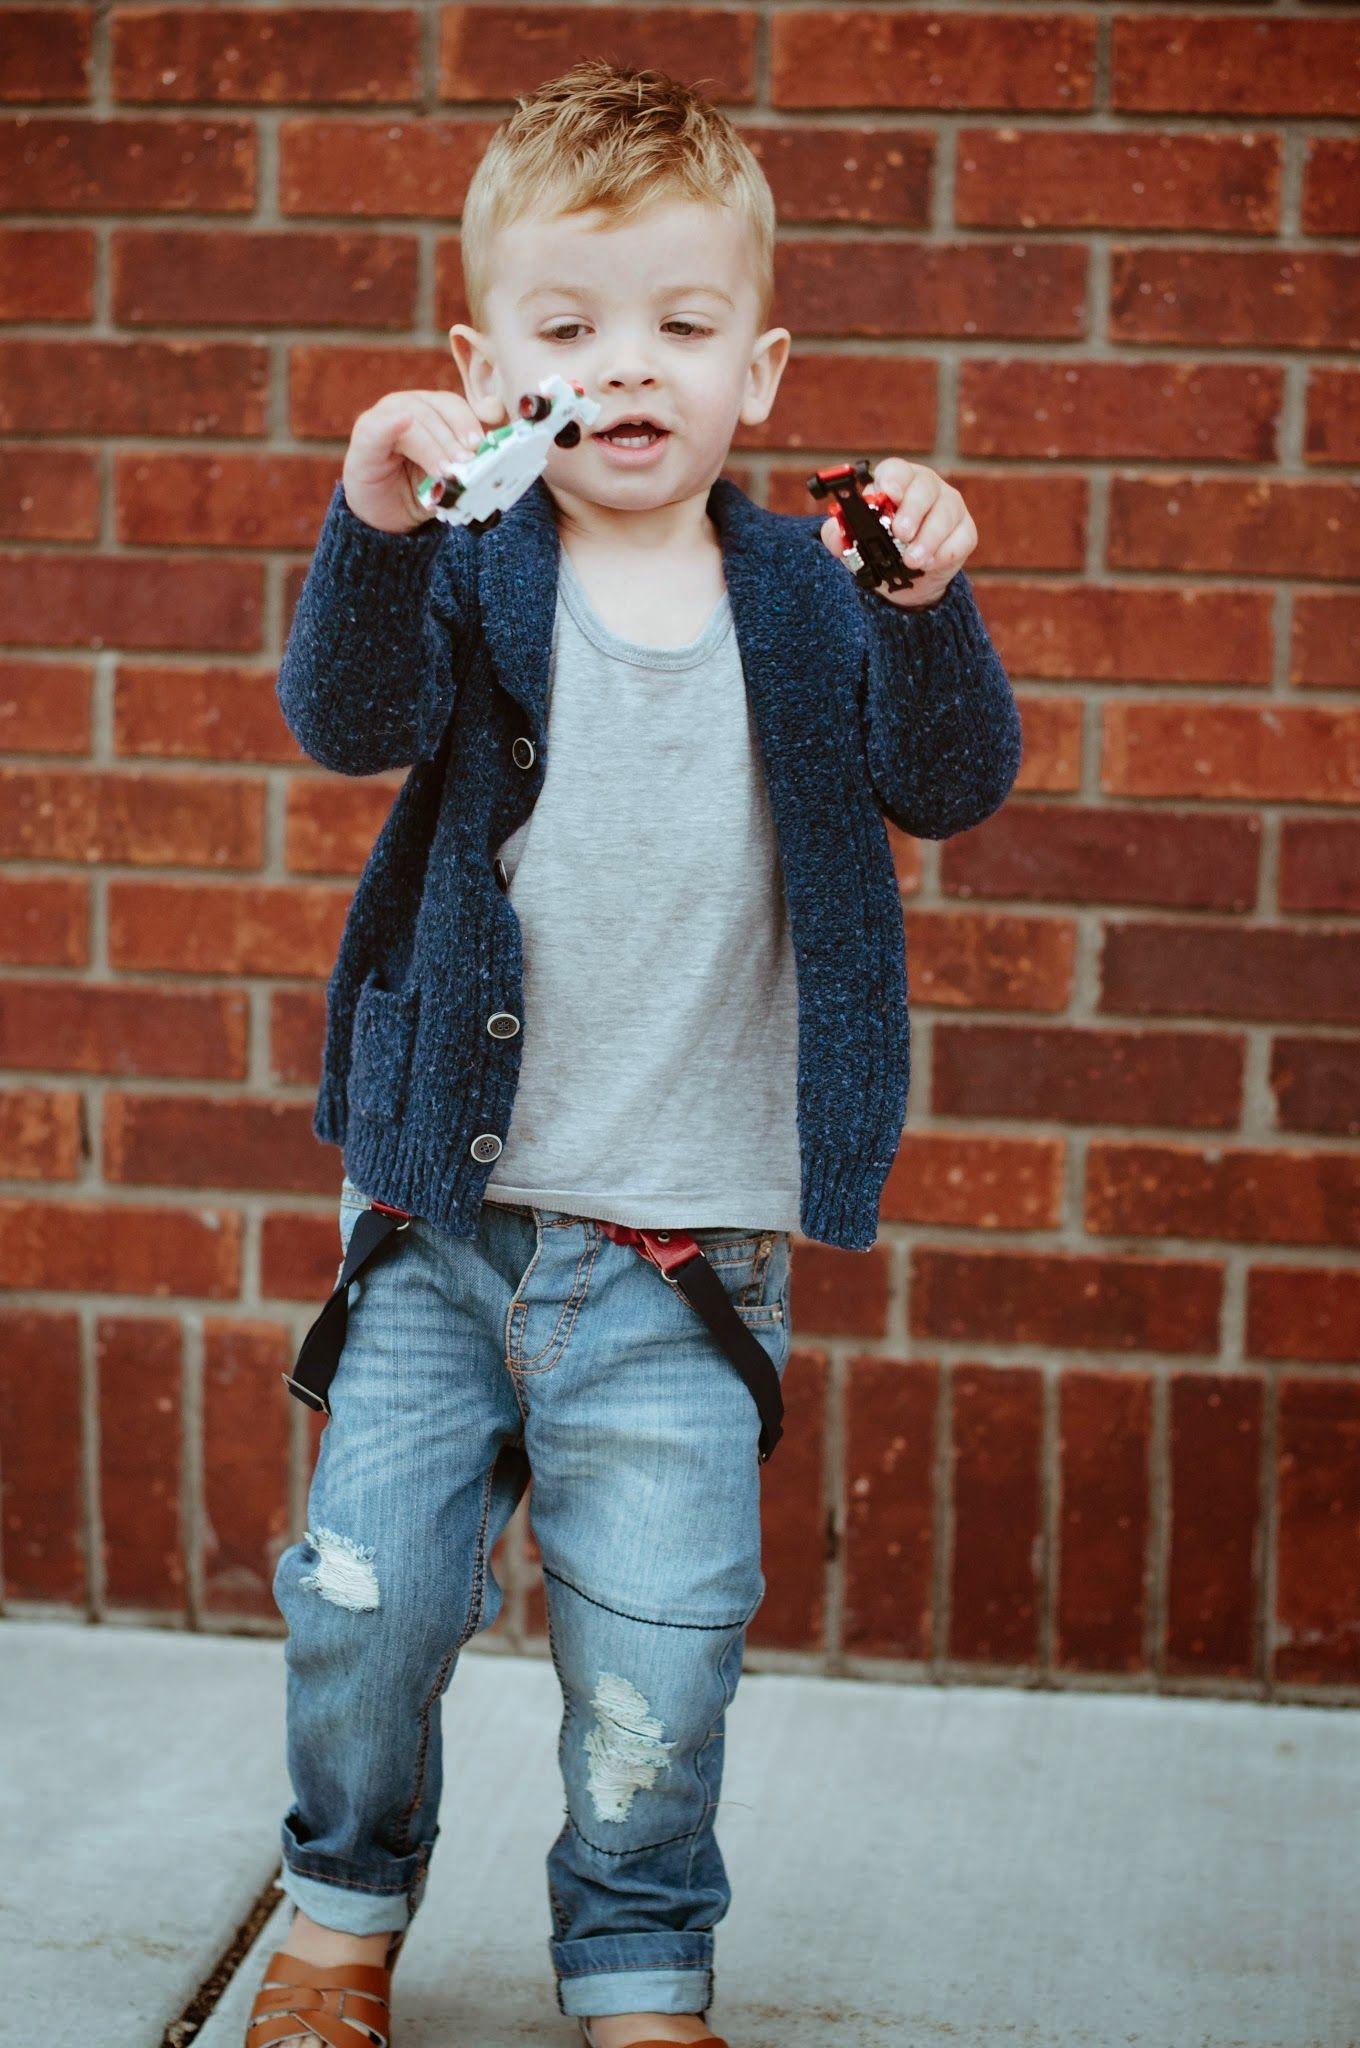 Black sandals for toddler boy - Hanes Outfit Tank H M Cardigan Zara Jeans Zara Sandals C